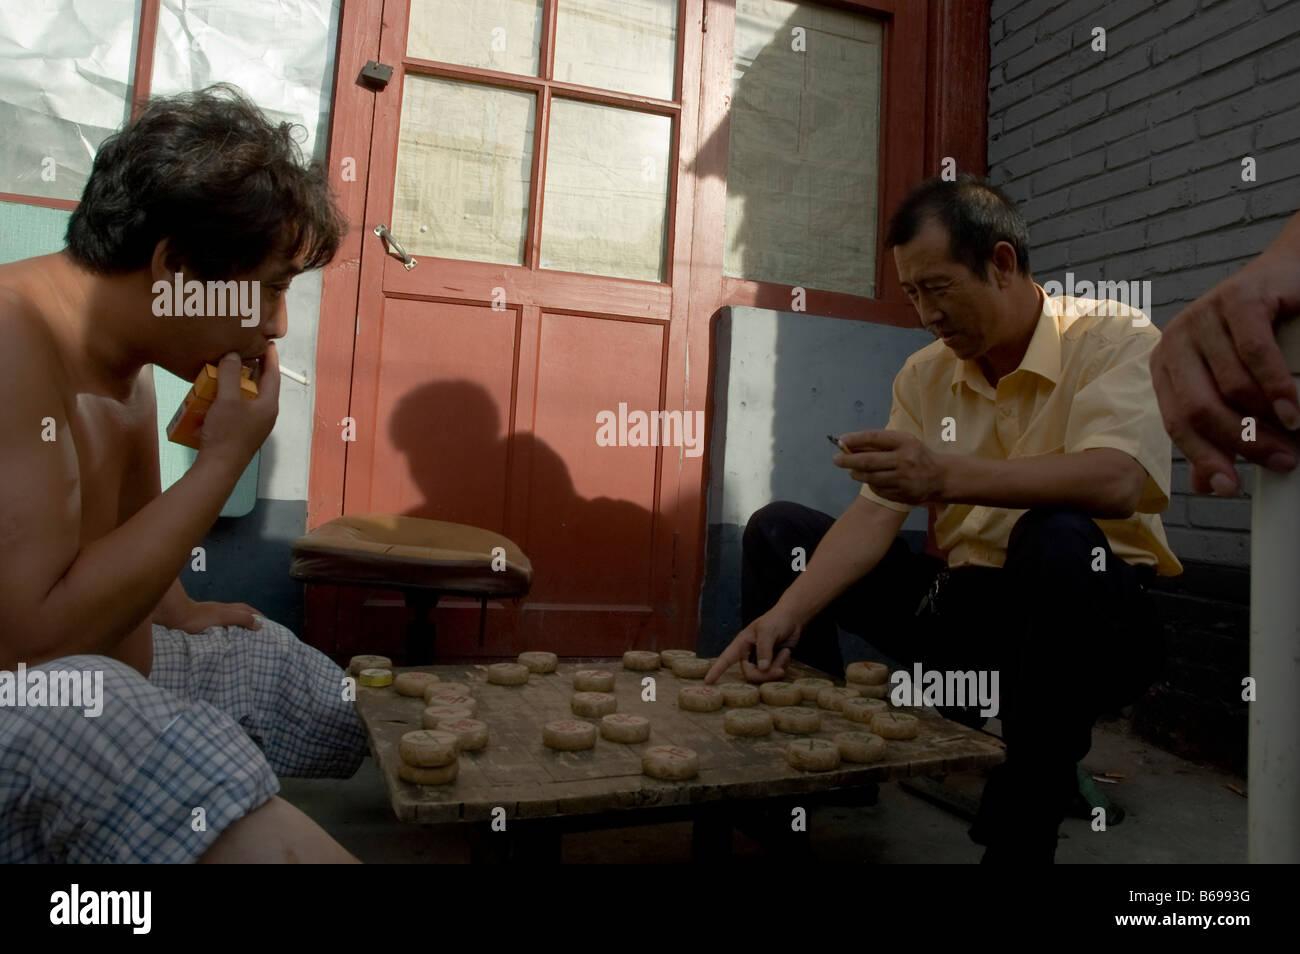 two men play chinese chess (xiangqi) - Stock Image